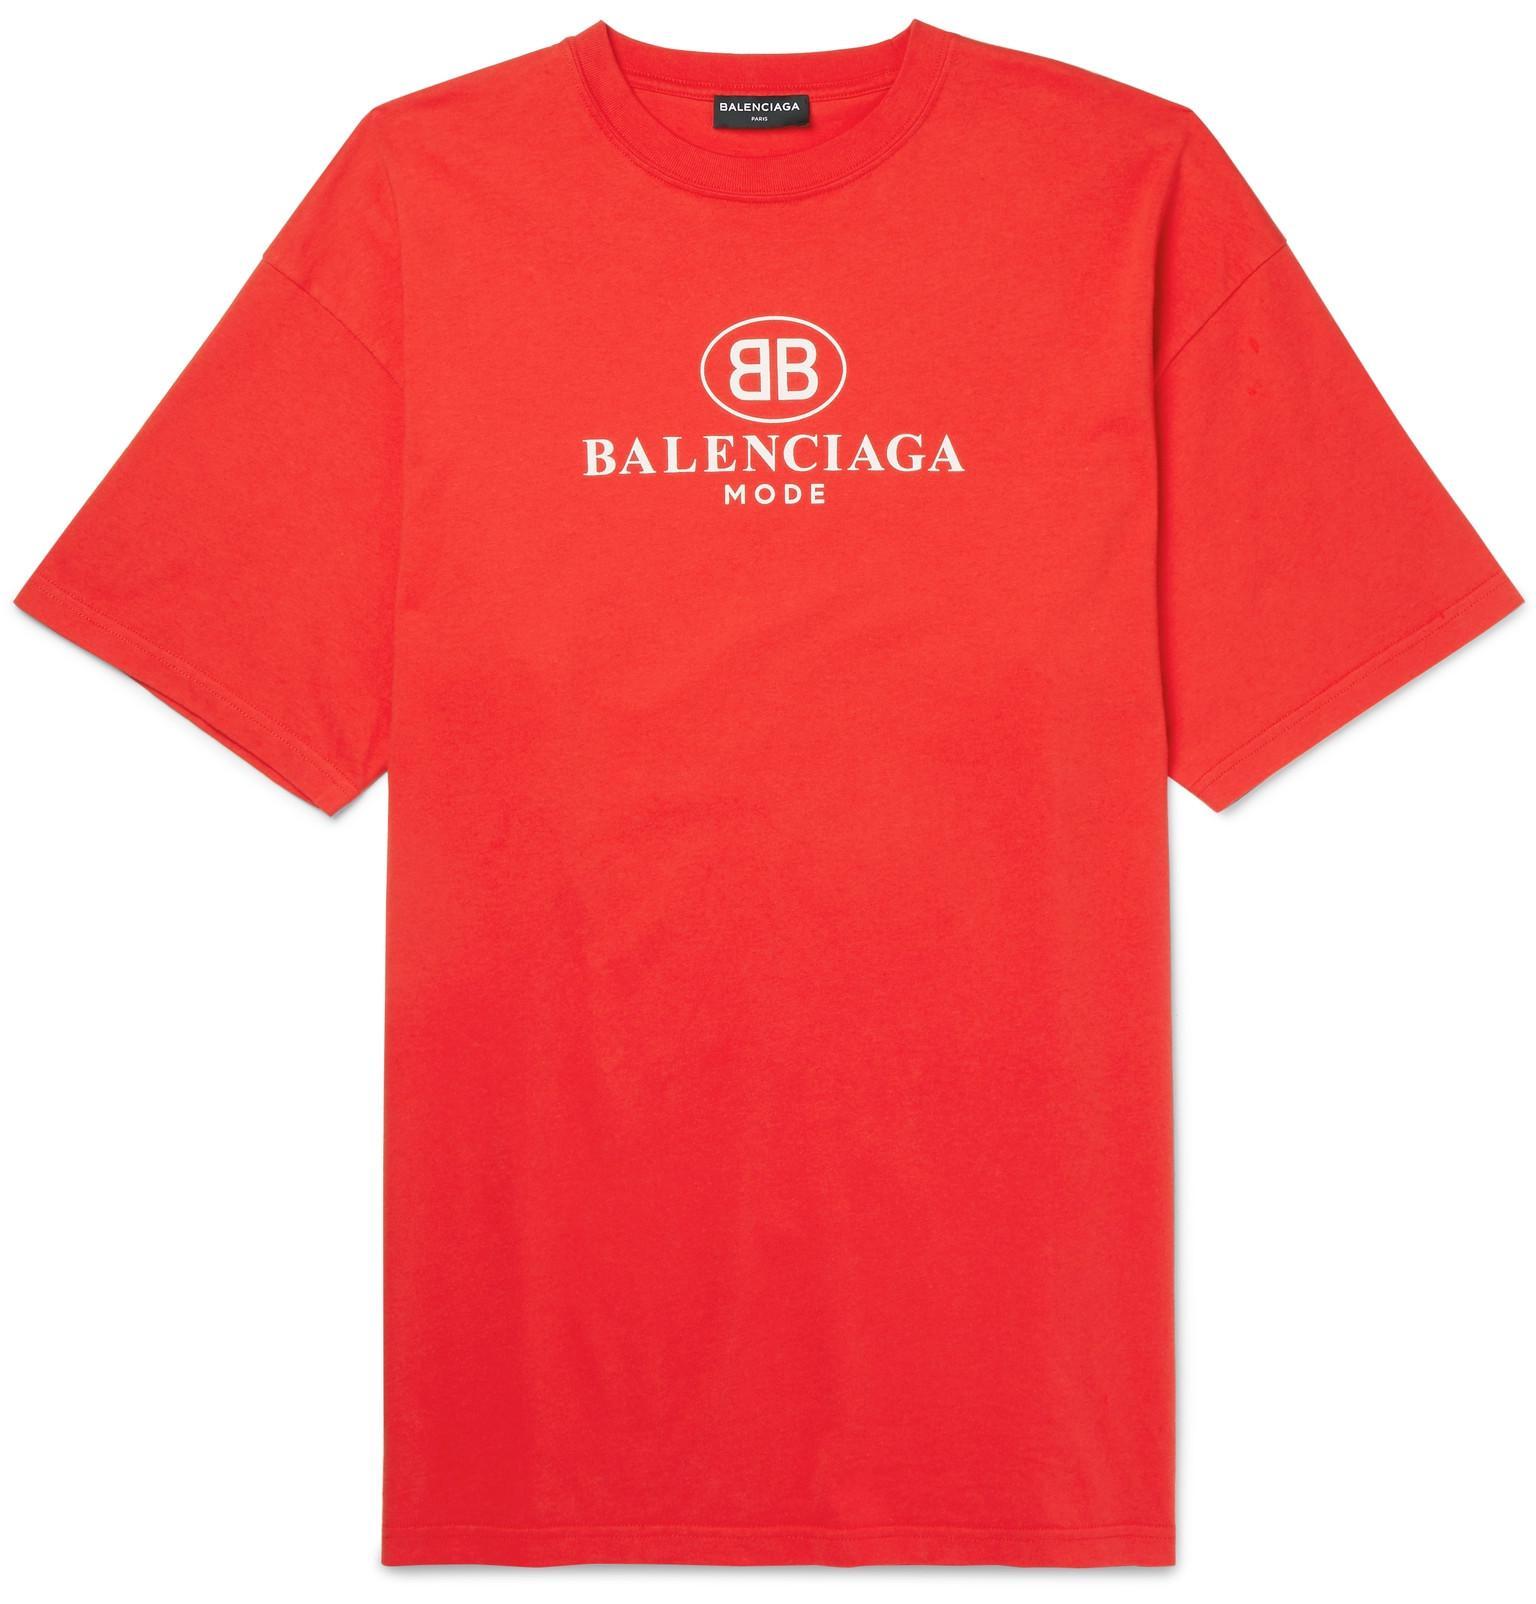 Lyst balenciaga printed cotton jersey t shirt in red for men for Balenciaga t shirt red